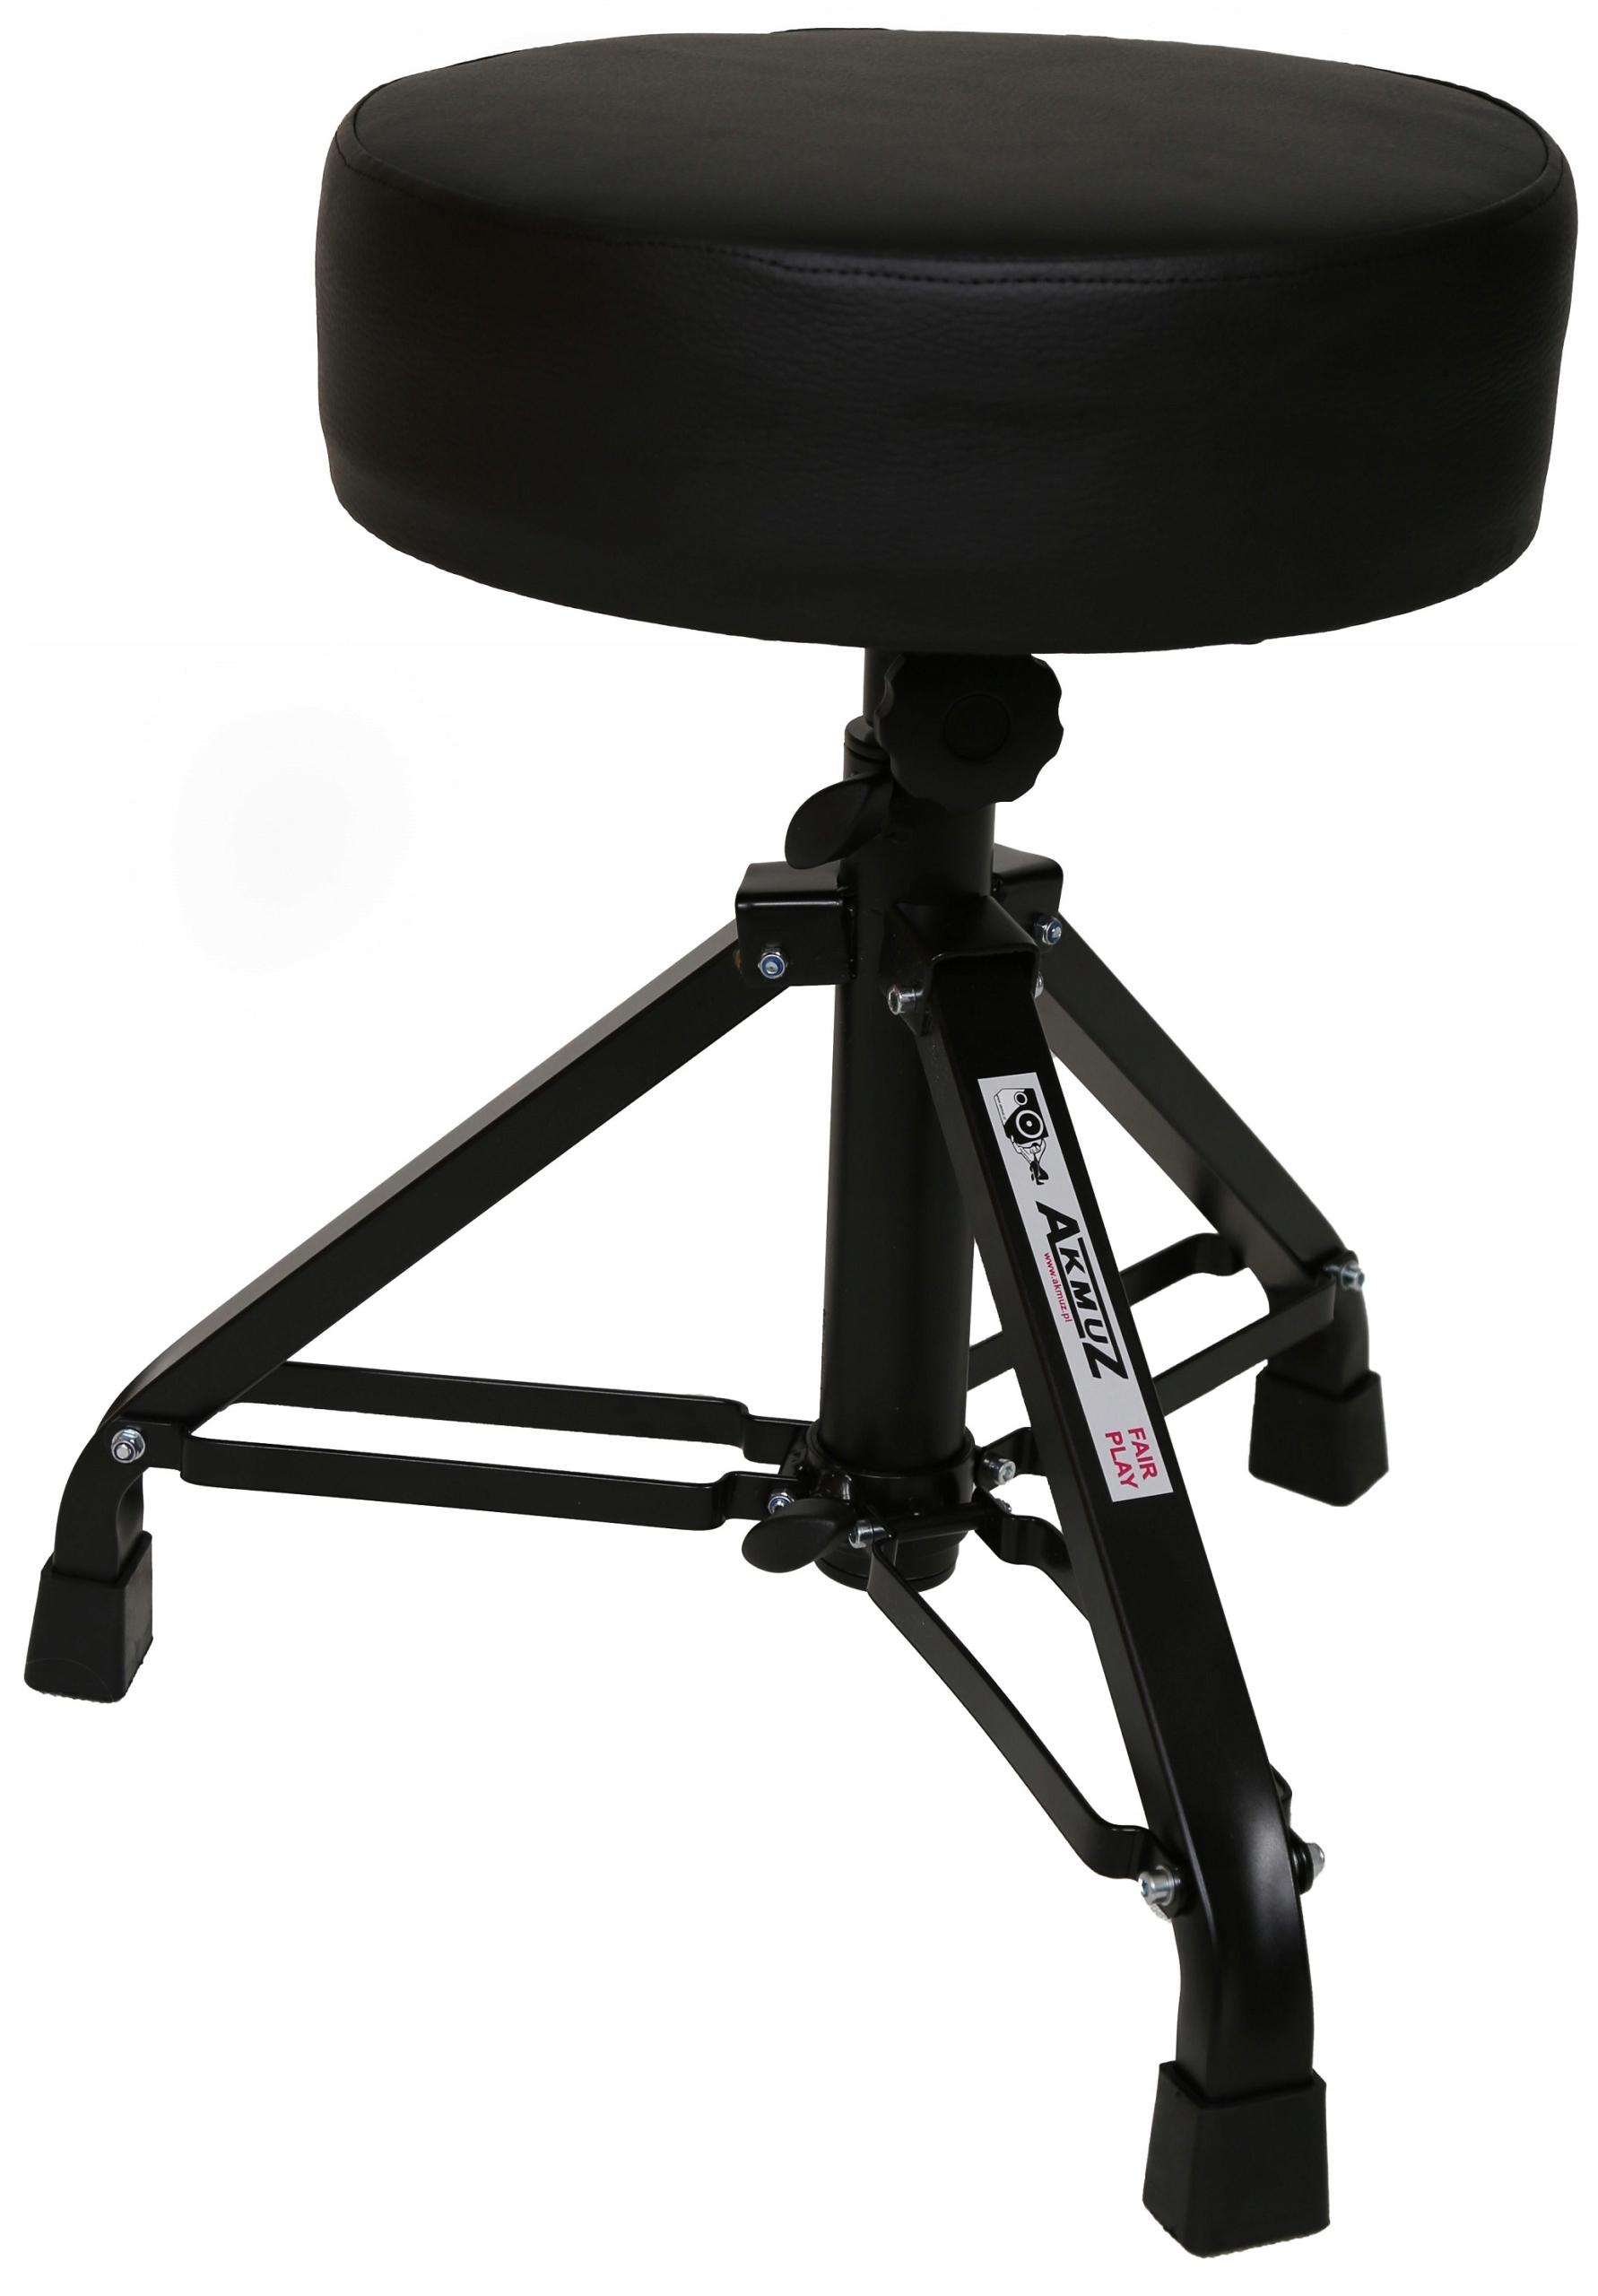 AKMUZ T-10 Percussion Stool Percussion TABASEET